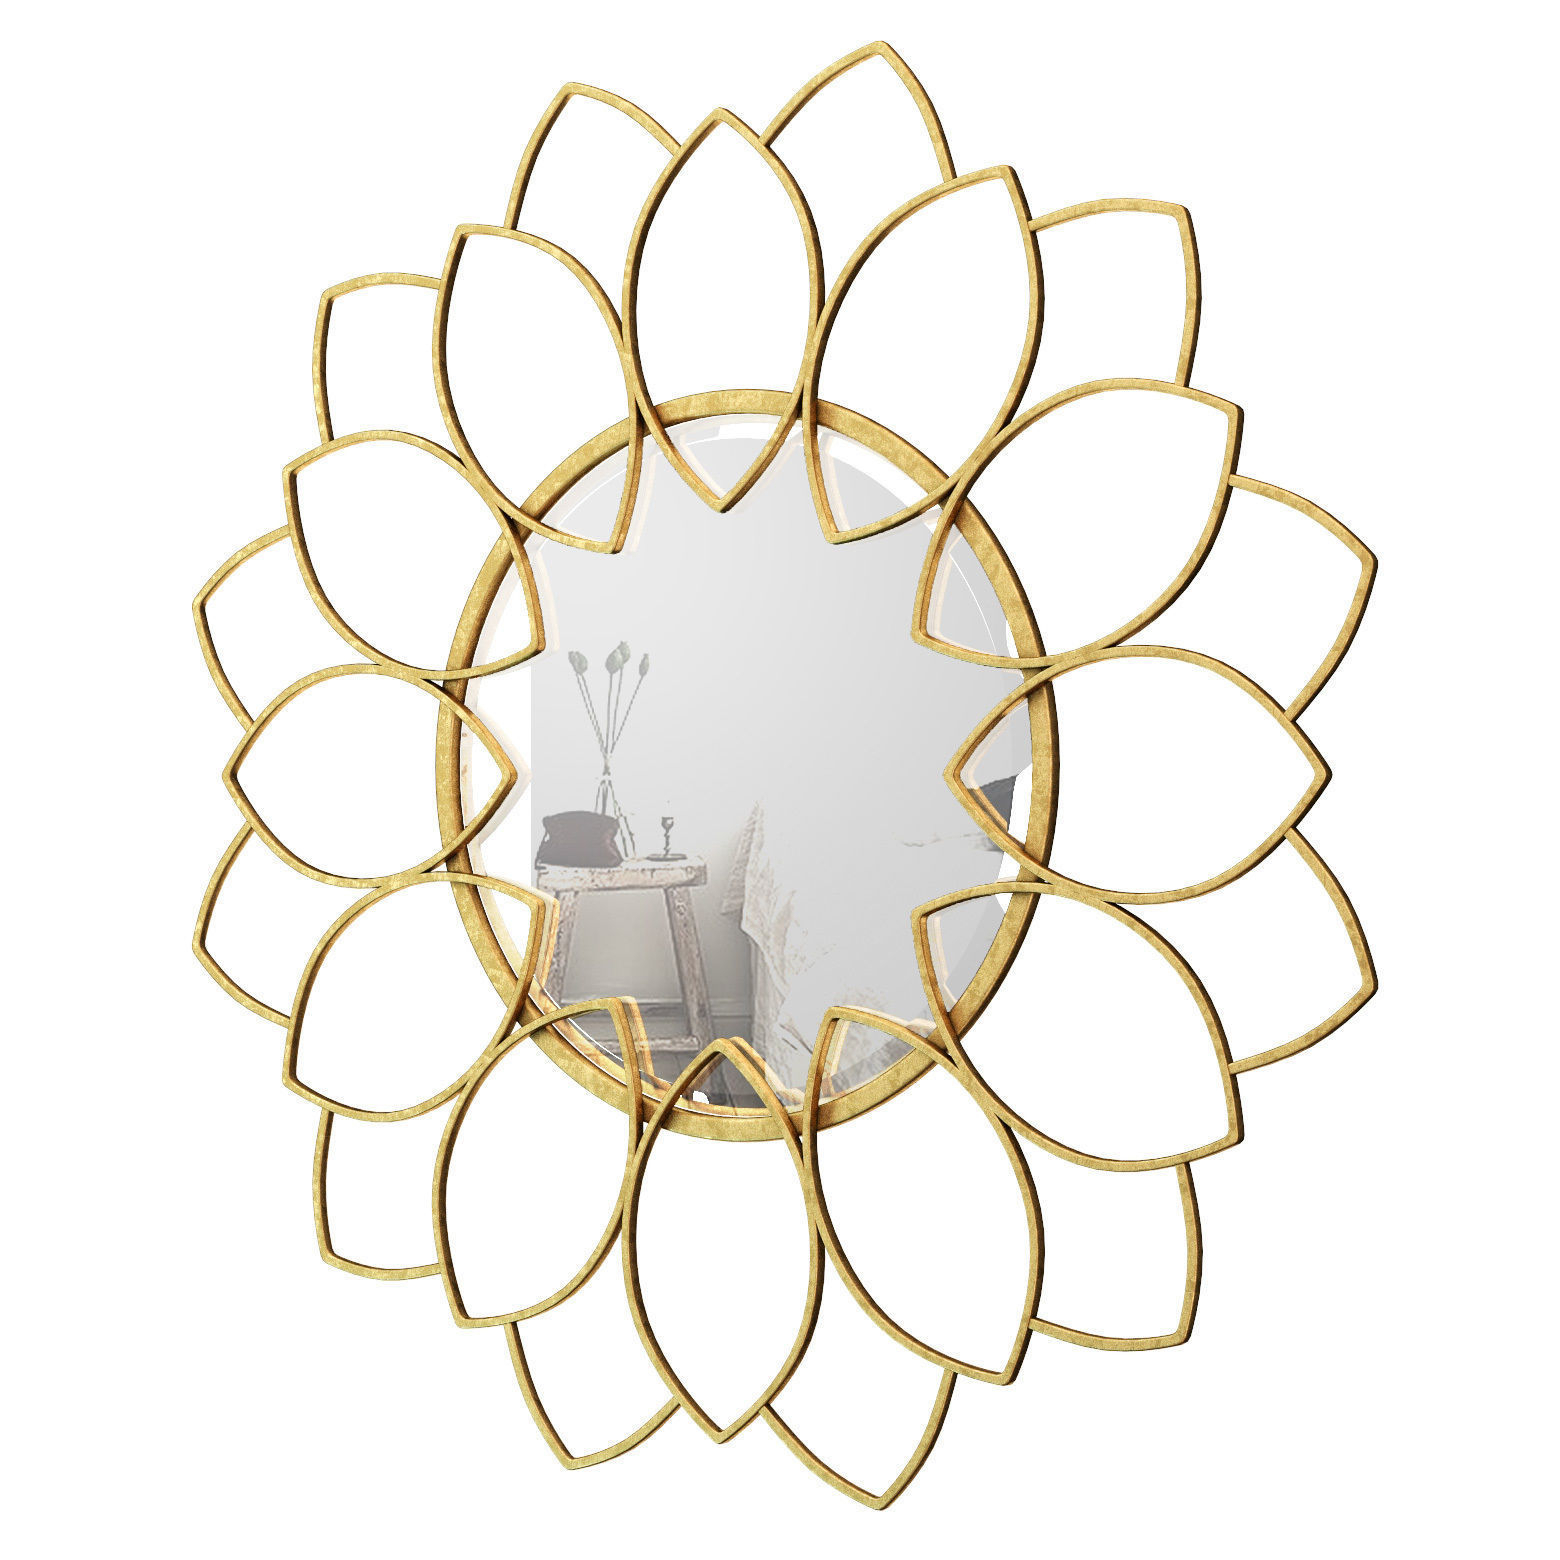 Trendy Brynn Accent Mirror Wrlo7002 (Gallery 2 of 20)